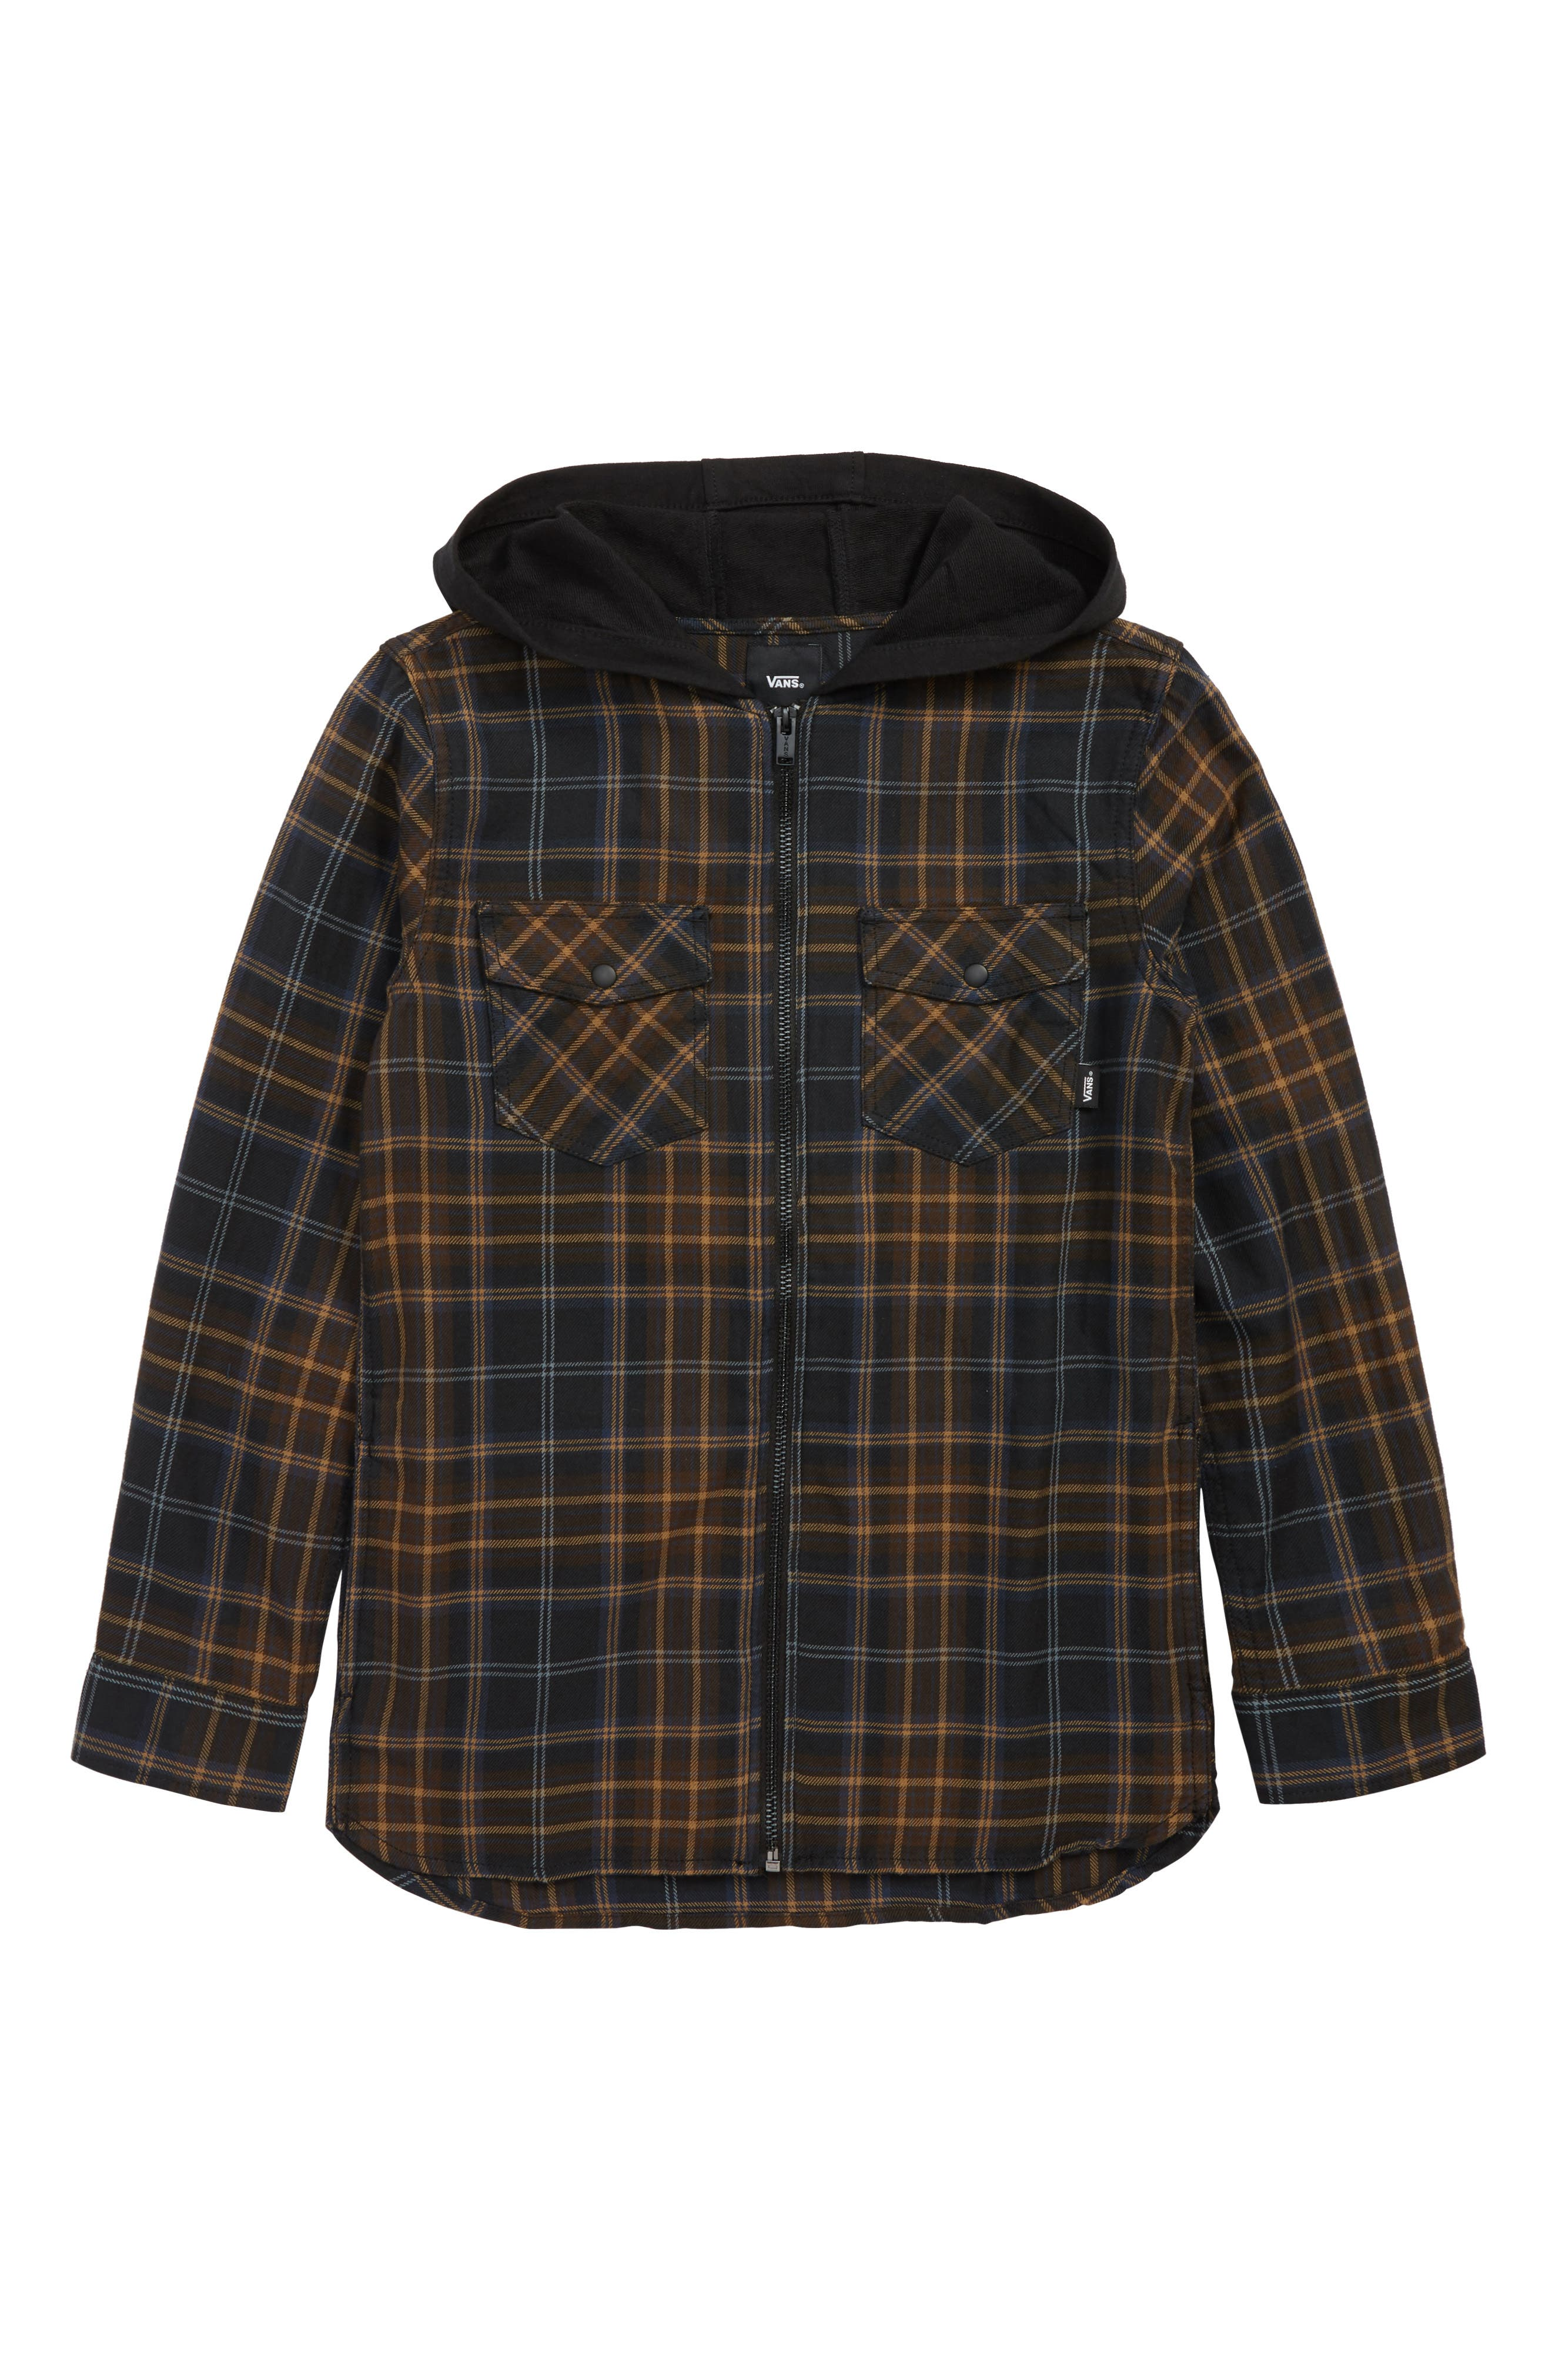 Higgins Zip Flannel Shirt,                         Main,                         color, 001